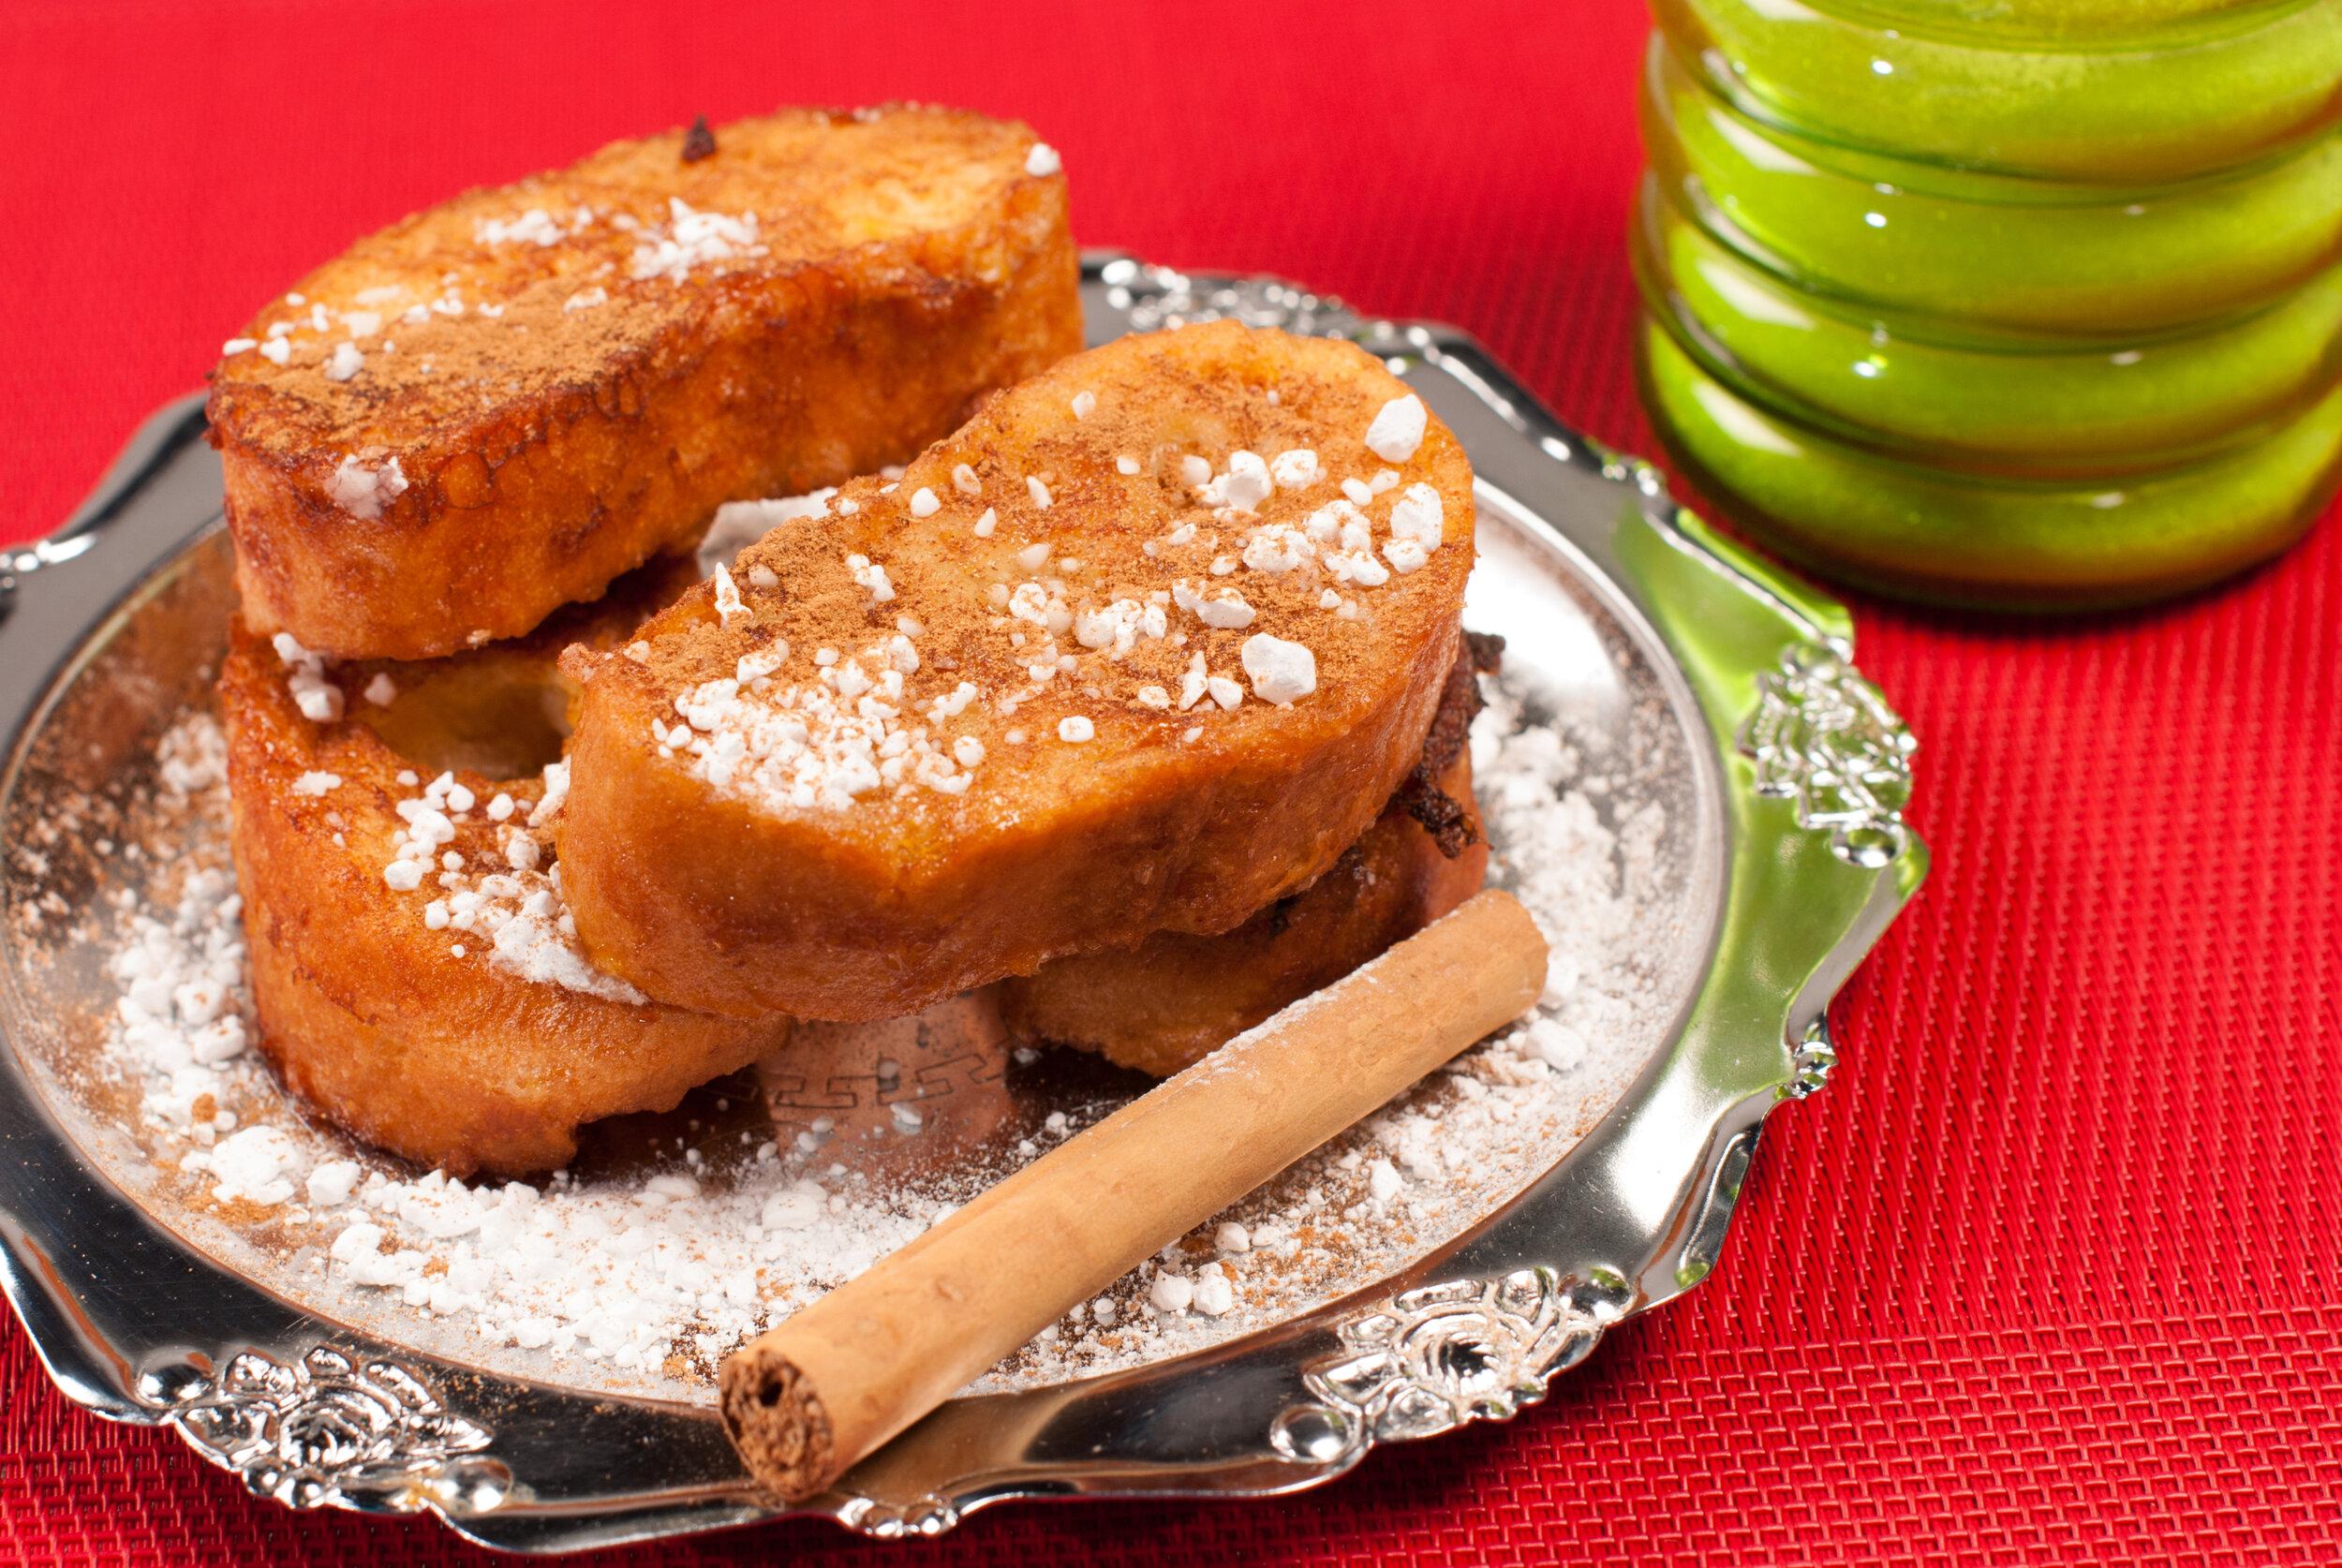 Tasty Malaga sweet, Torrijas, Spanish-style French toast